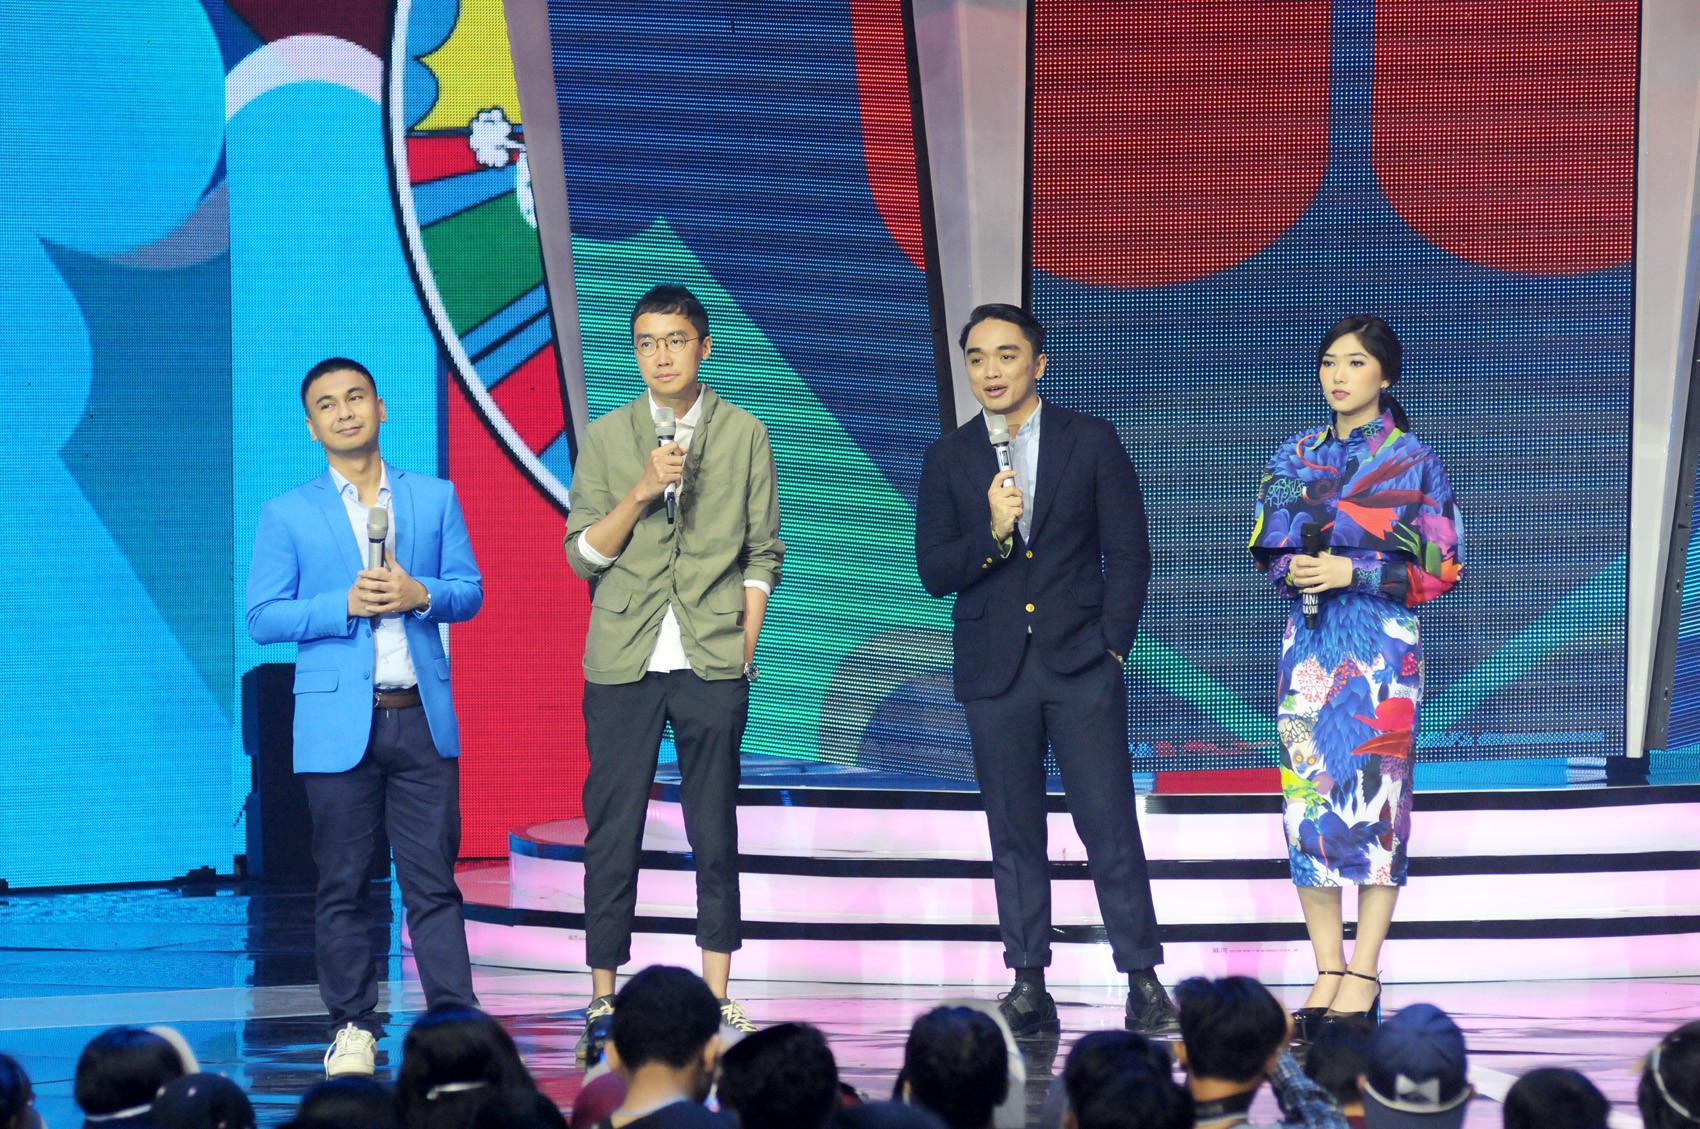 Cornetto Pop Awards (Daniel Kampua/Bintang.com)